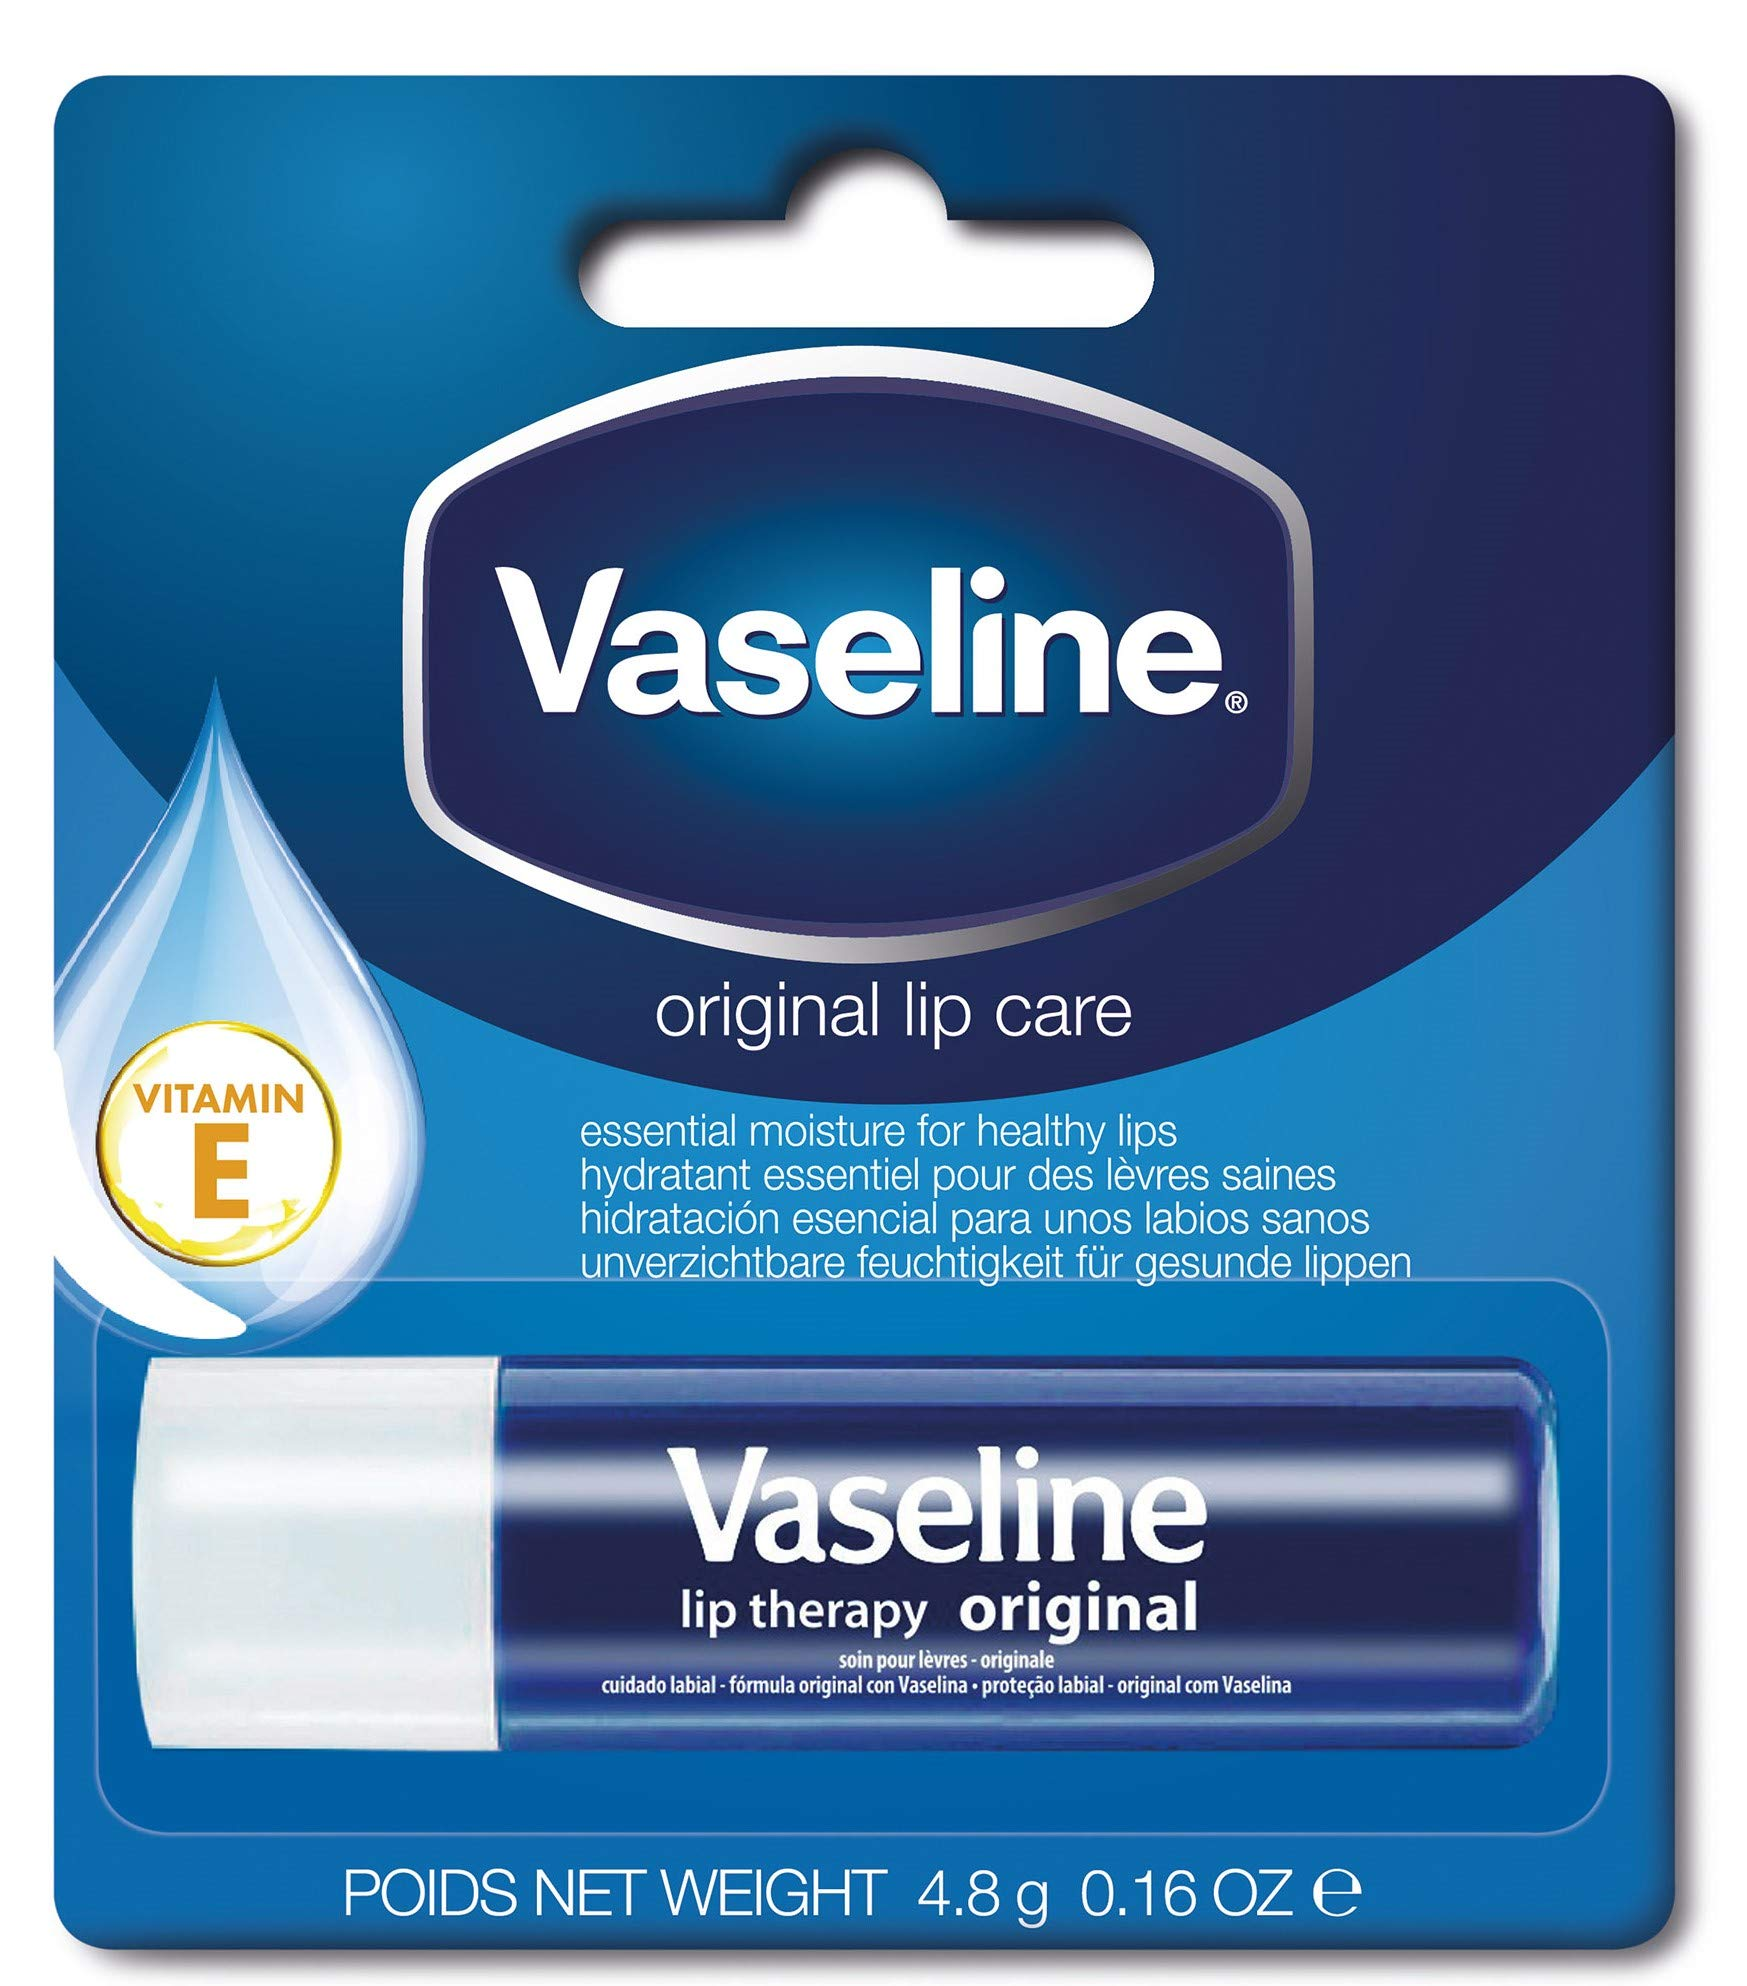 Vaseline Lip Therapy Original Balm, 4.8 gms